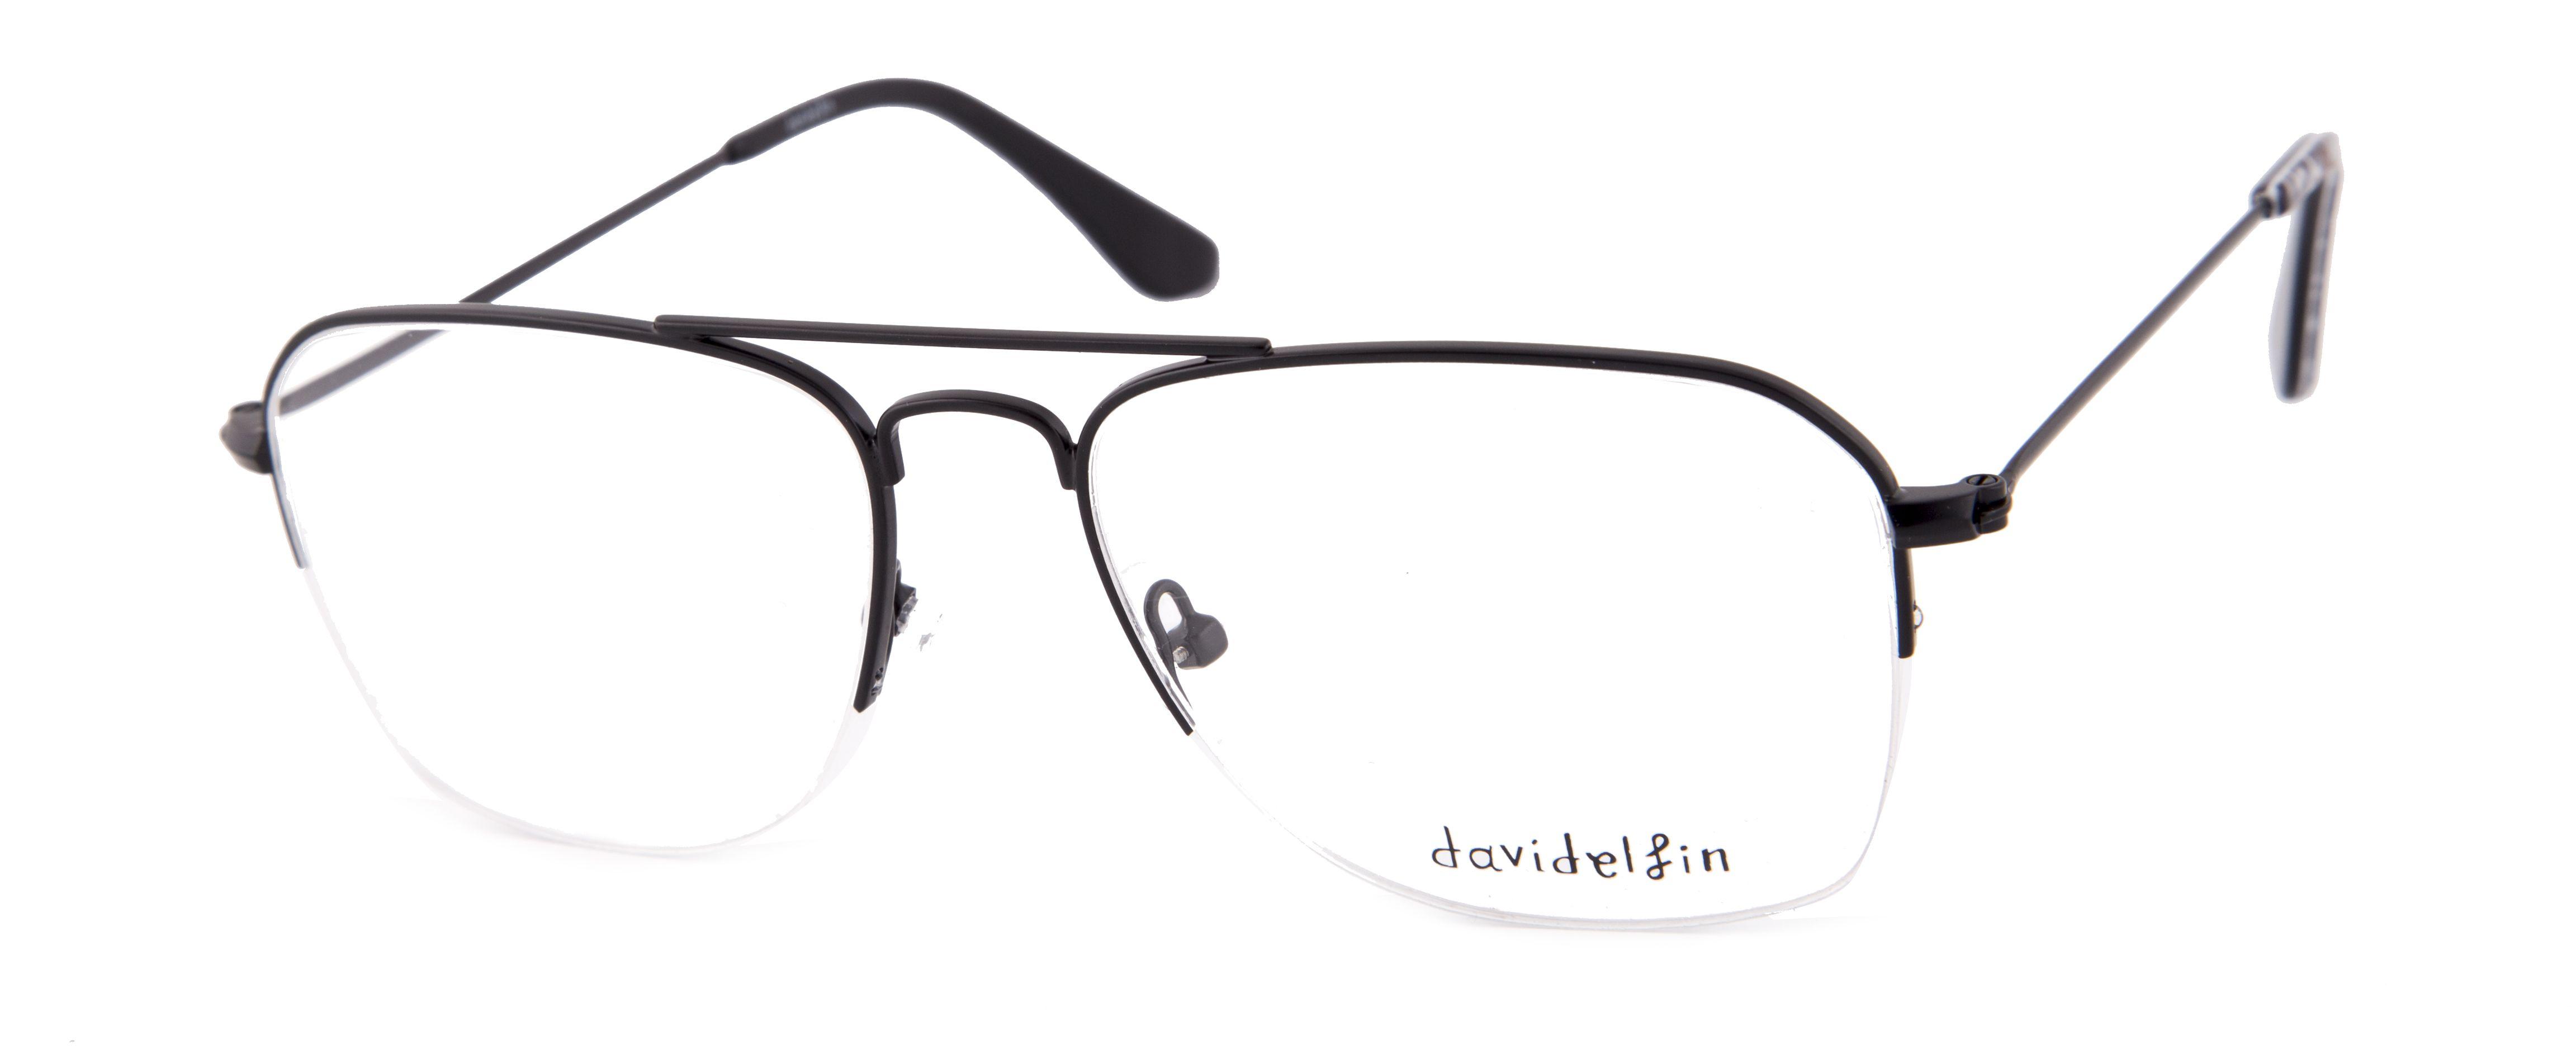 b43f1b7cf4 Gafas diseñadas por Davidelfin para Opticalia. Montura de estilo aviador  semi al aire